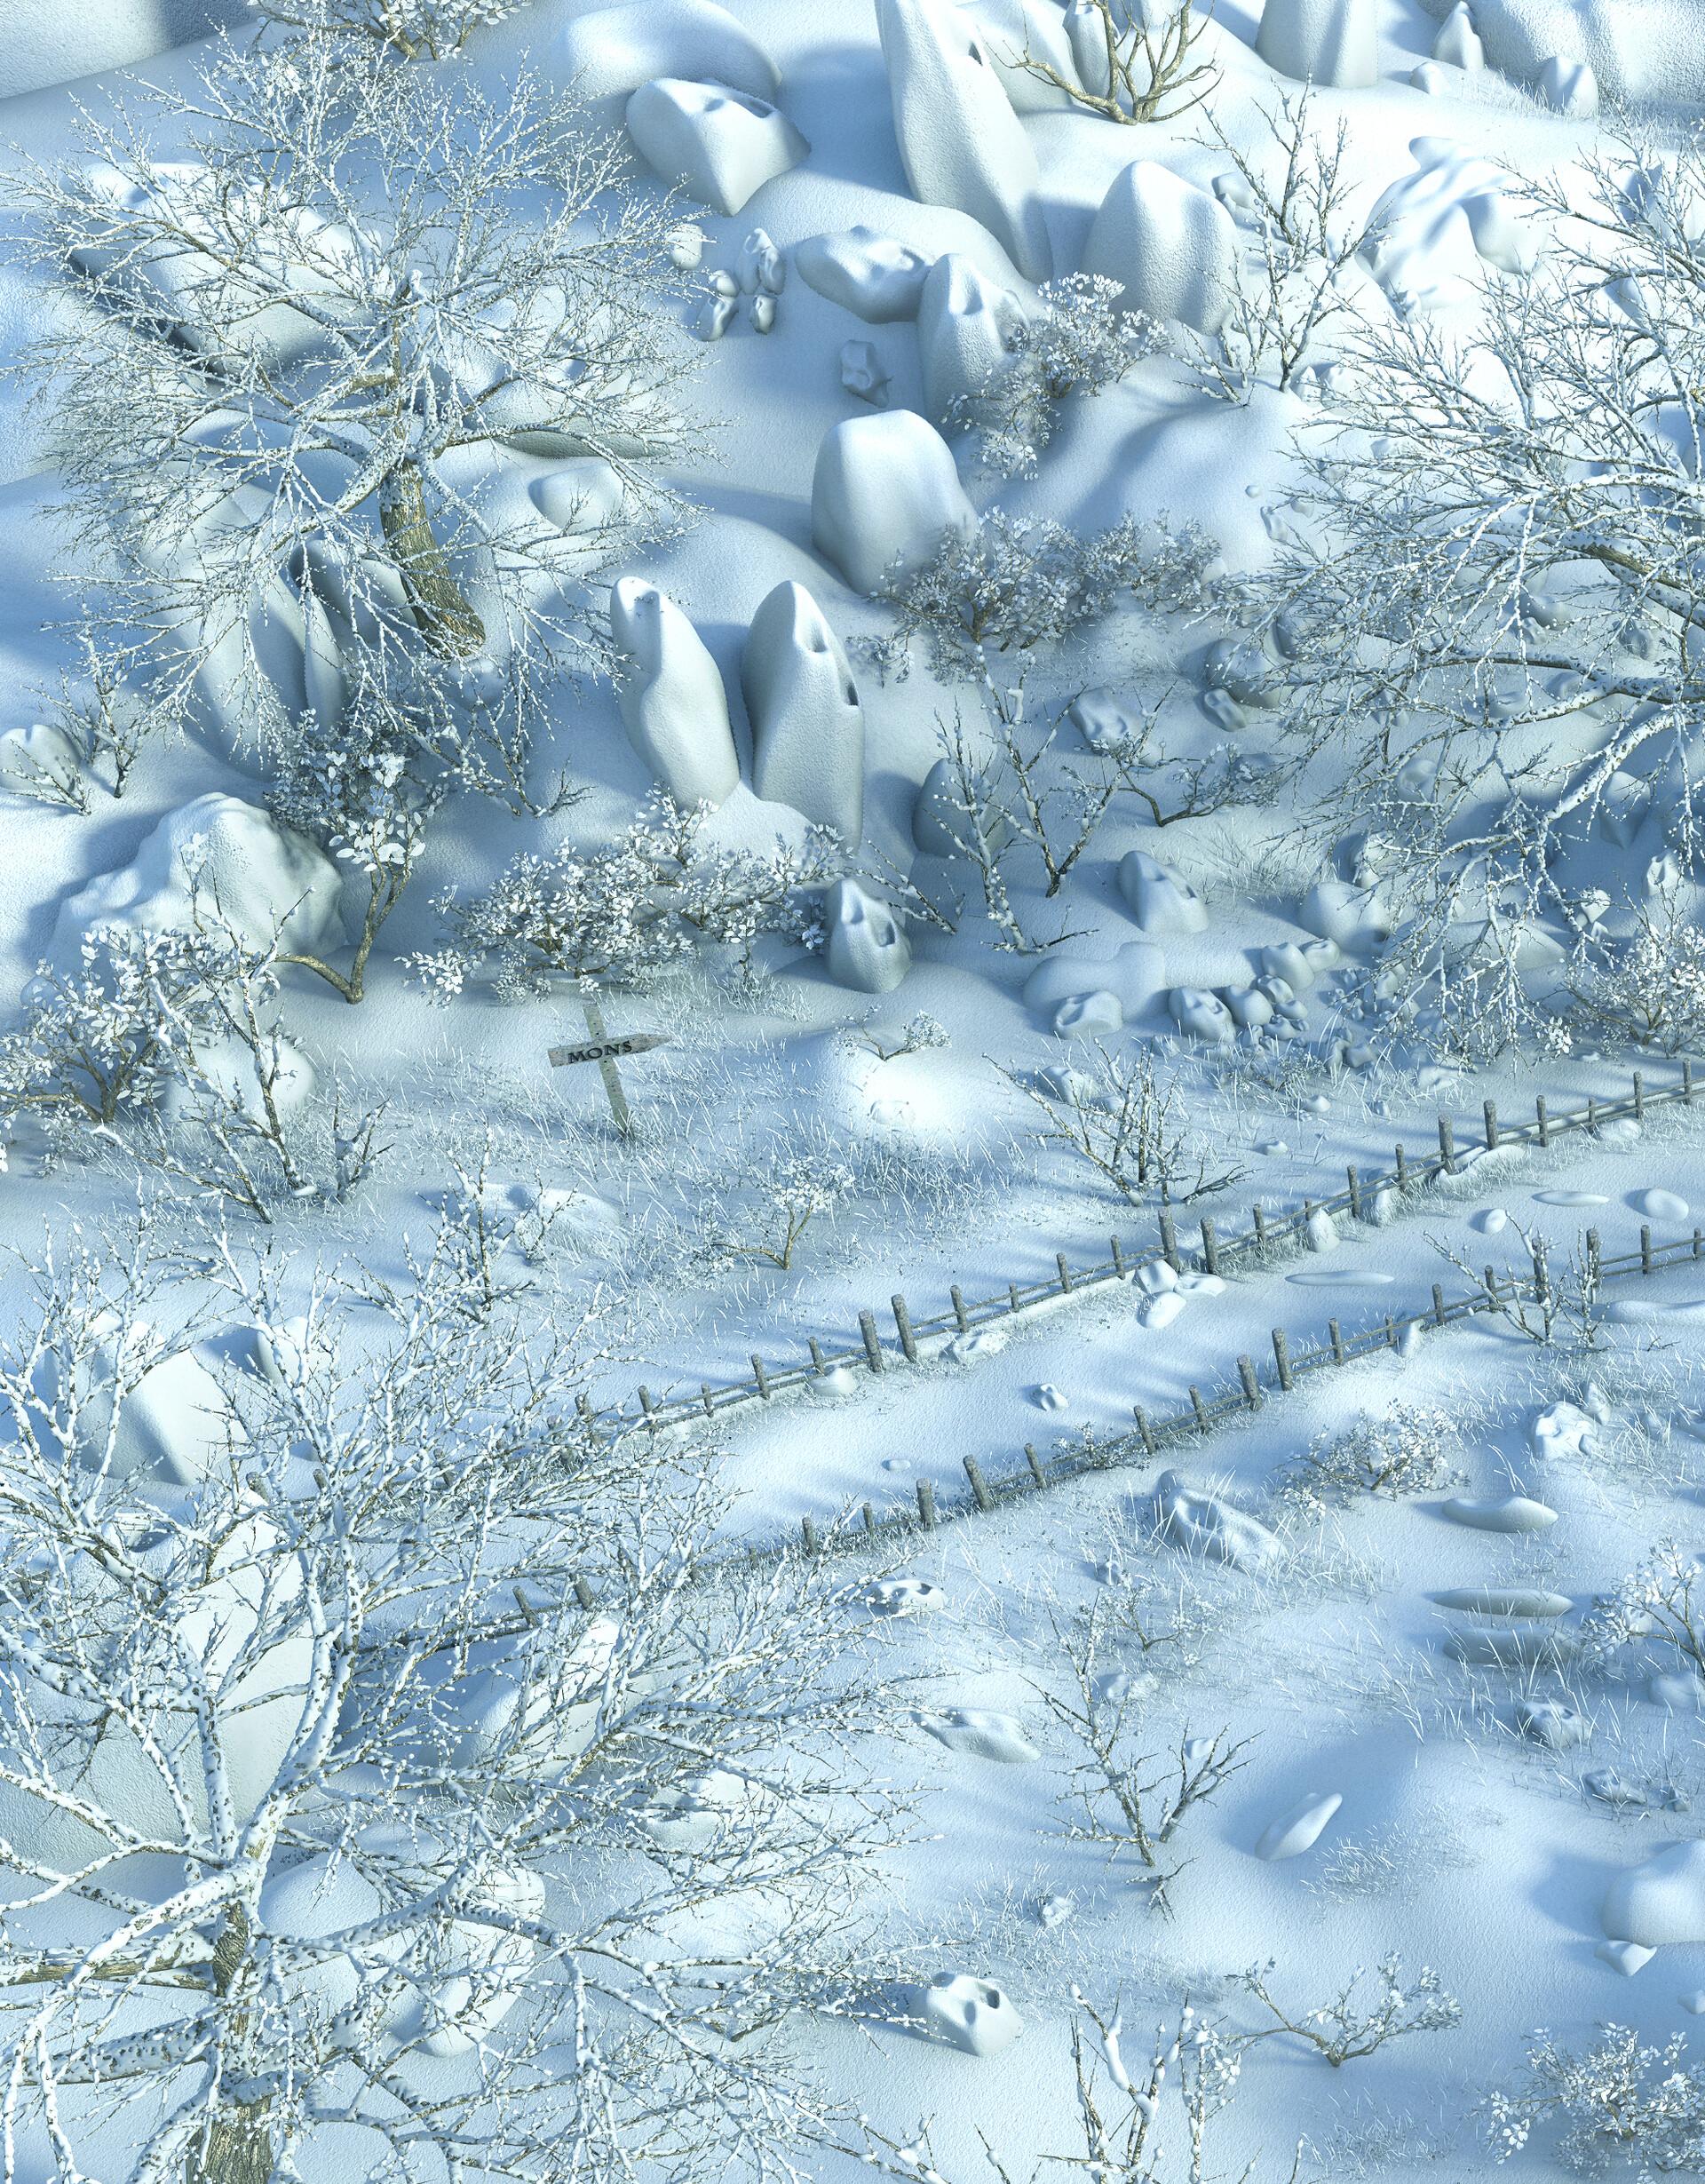 Marc mons snow3